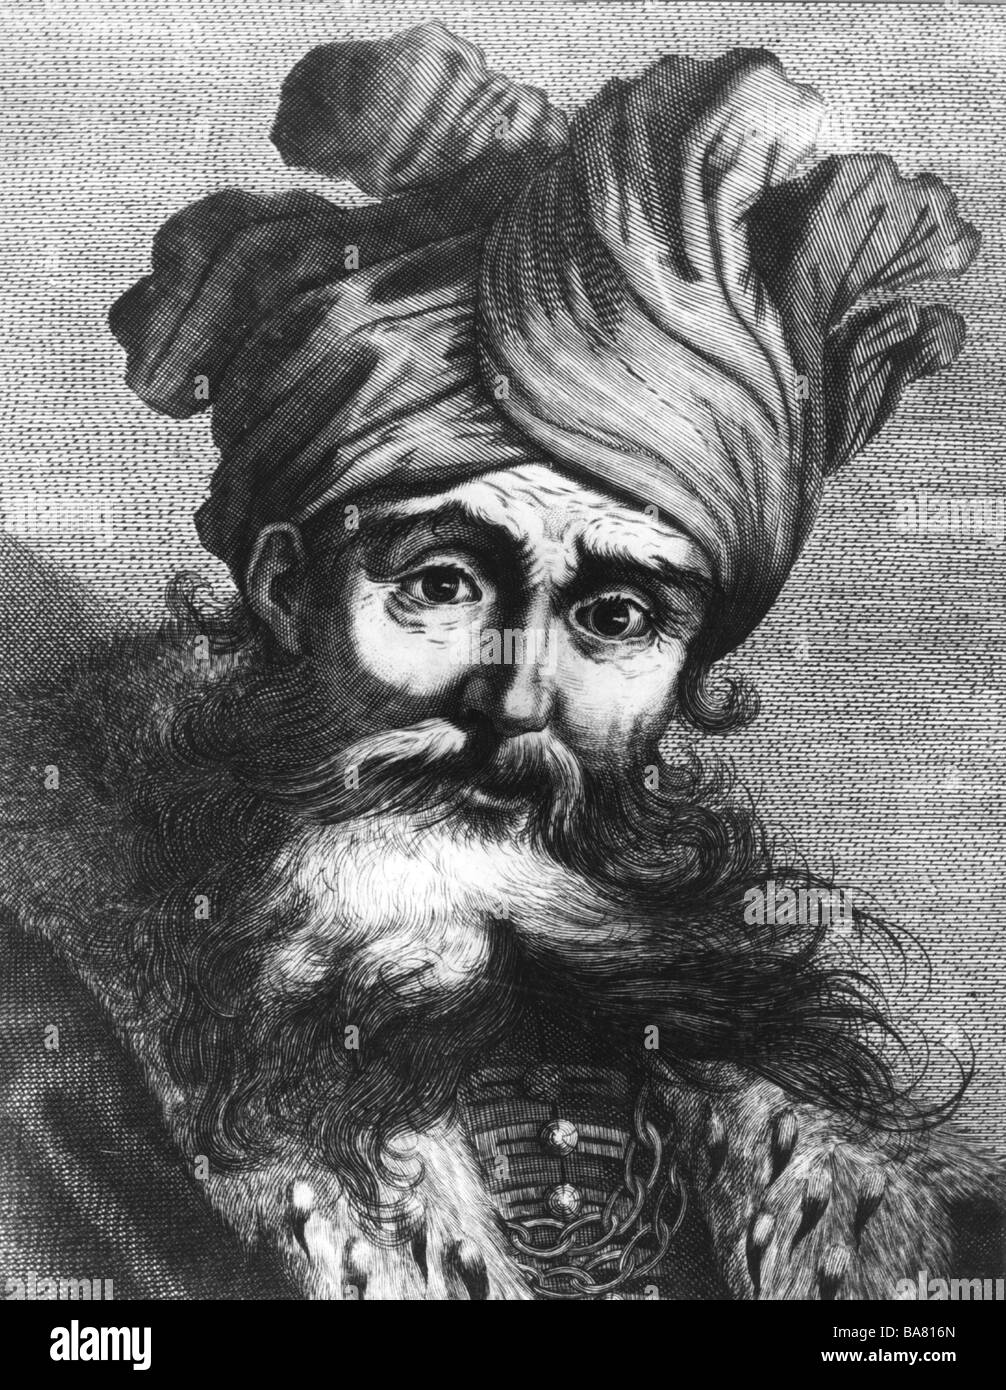 Saladin (Salah ad-din Yussuf Ibn Ayyub), 1137 / 1138 - 4.3.1193, Sultan of Egypt, portrait, wood engraving, Additional - Stock Image